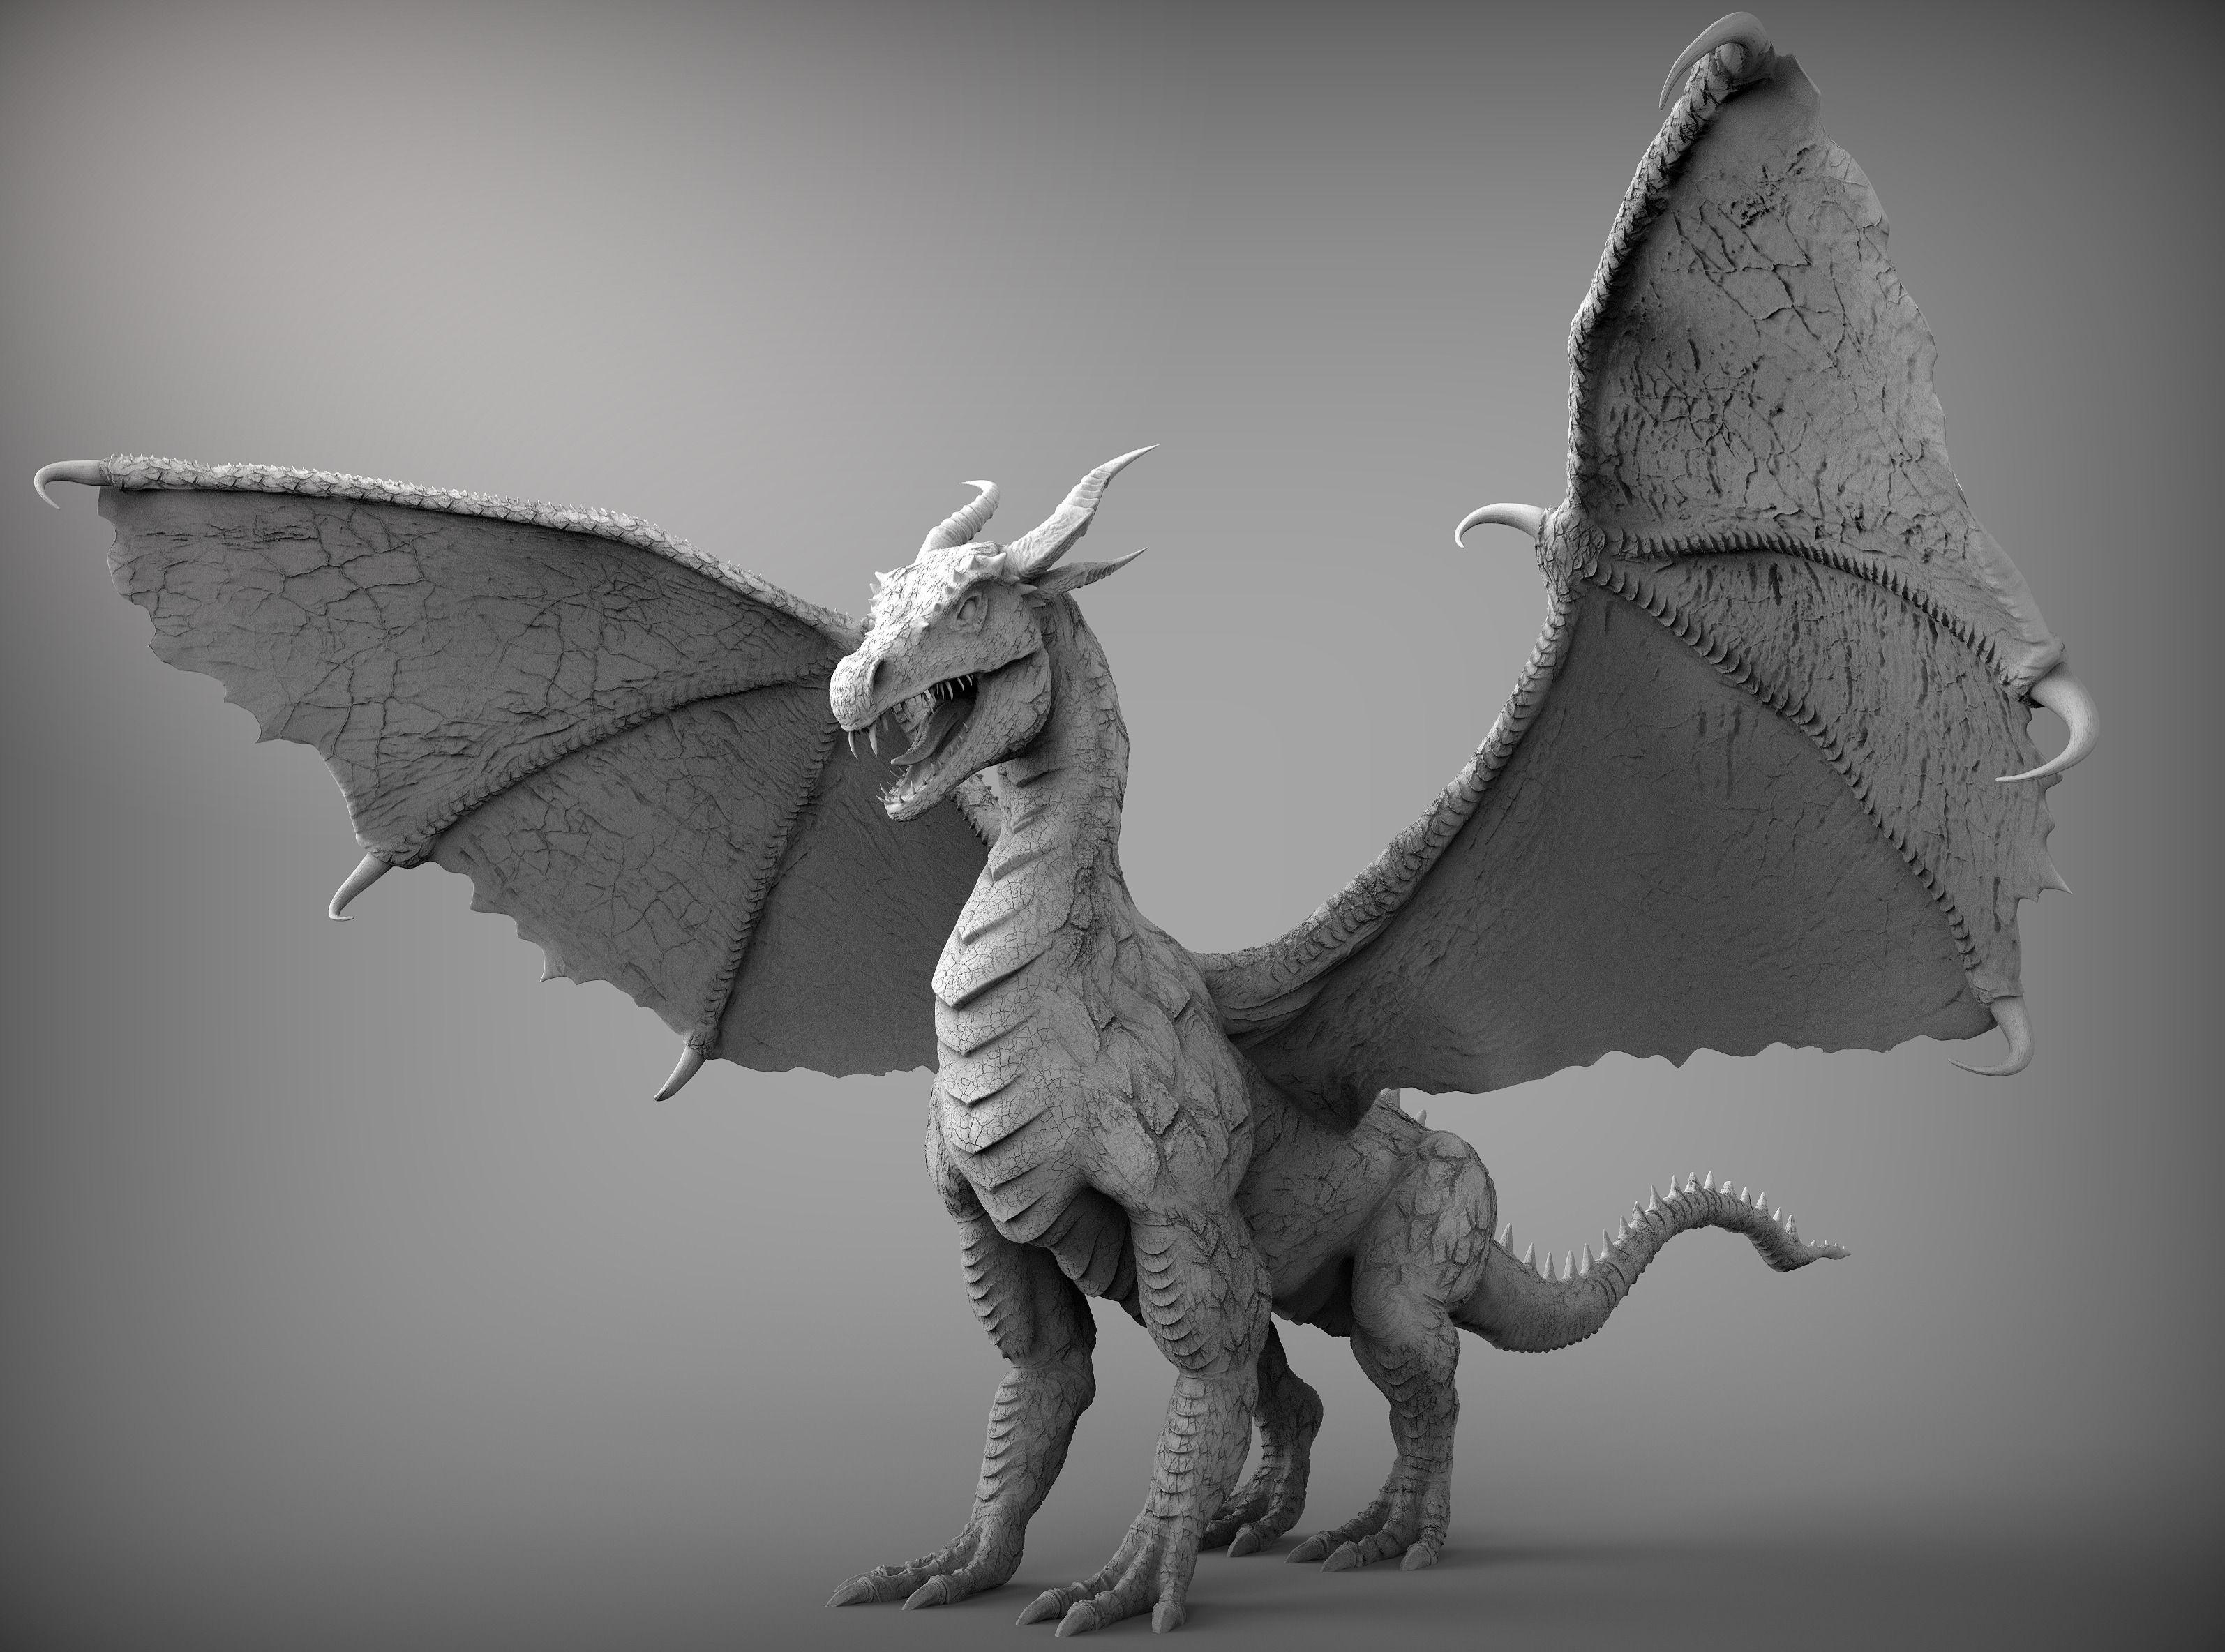 3d Cad Online Zbrush Dragon 3d Model Obj Ztl Cgtrader Com